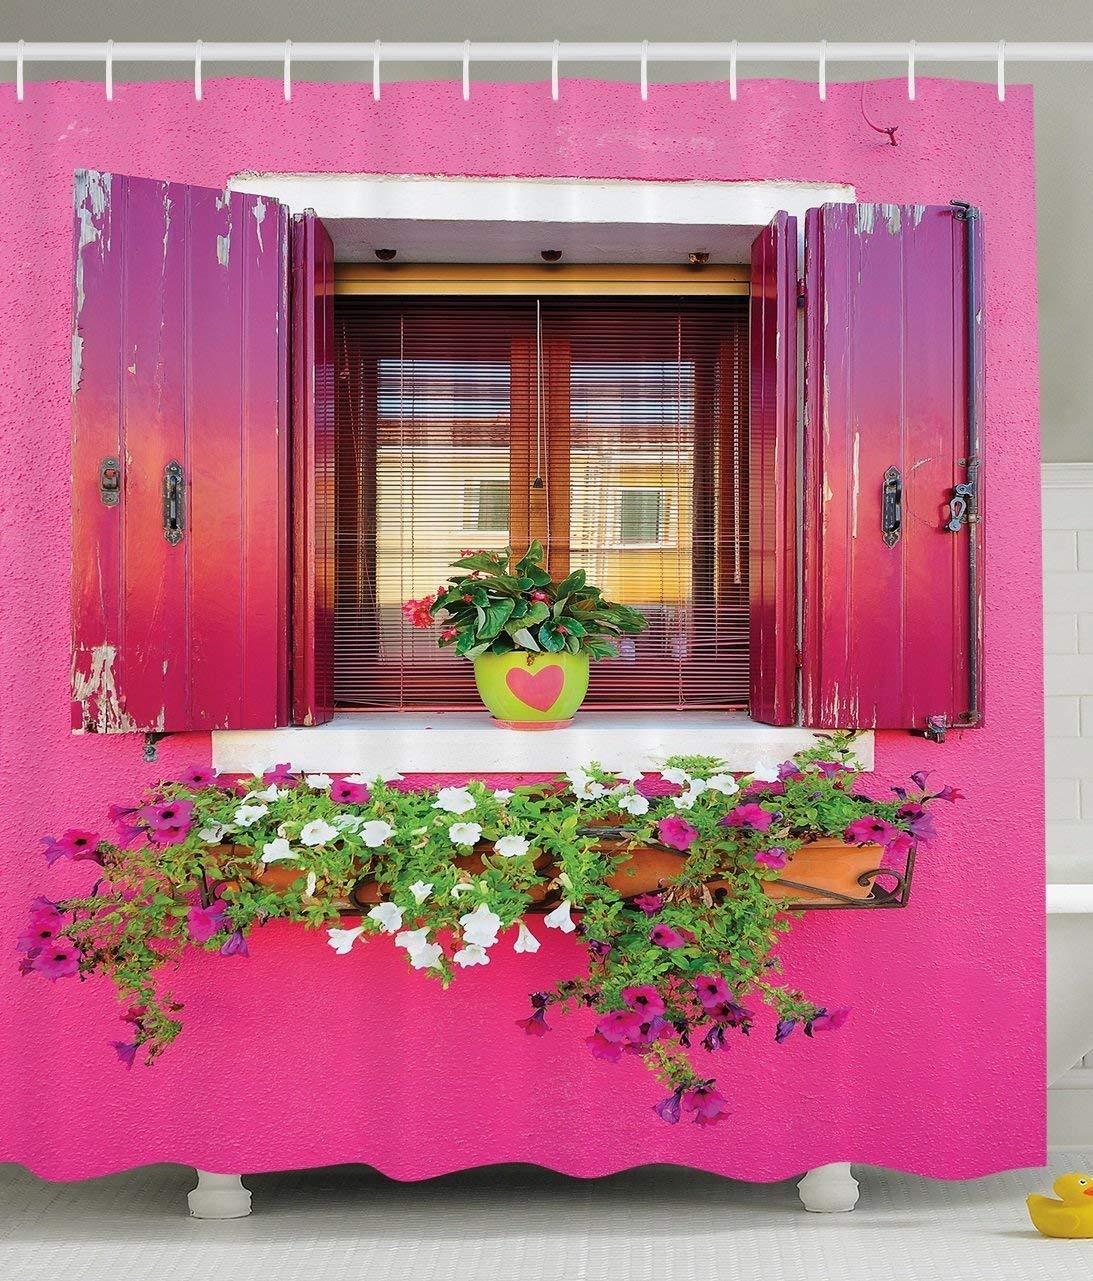 rosado Romantic Shower Curtain Dreams Romantic rosado Atmosphere Decor Lovers House Wooden Windows Hearts Flowers Bougainvilleas Fantastic Bathroom Decorations Digital Printed Photo Print Fabric Fuchsia verde White 72 X 72